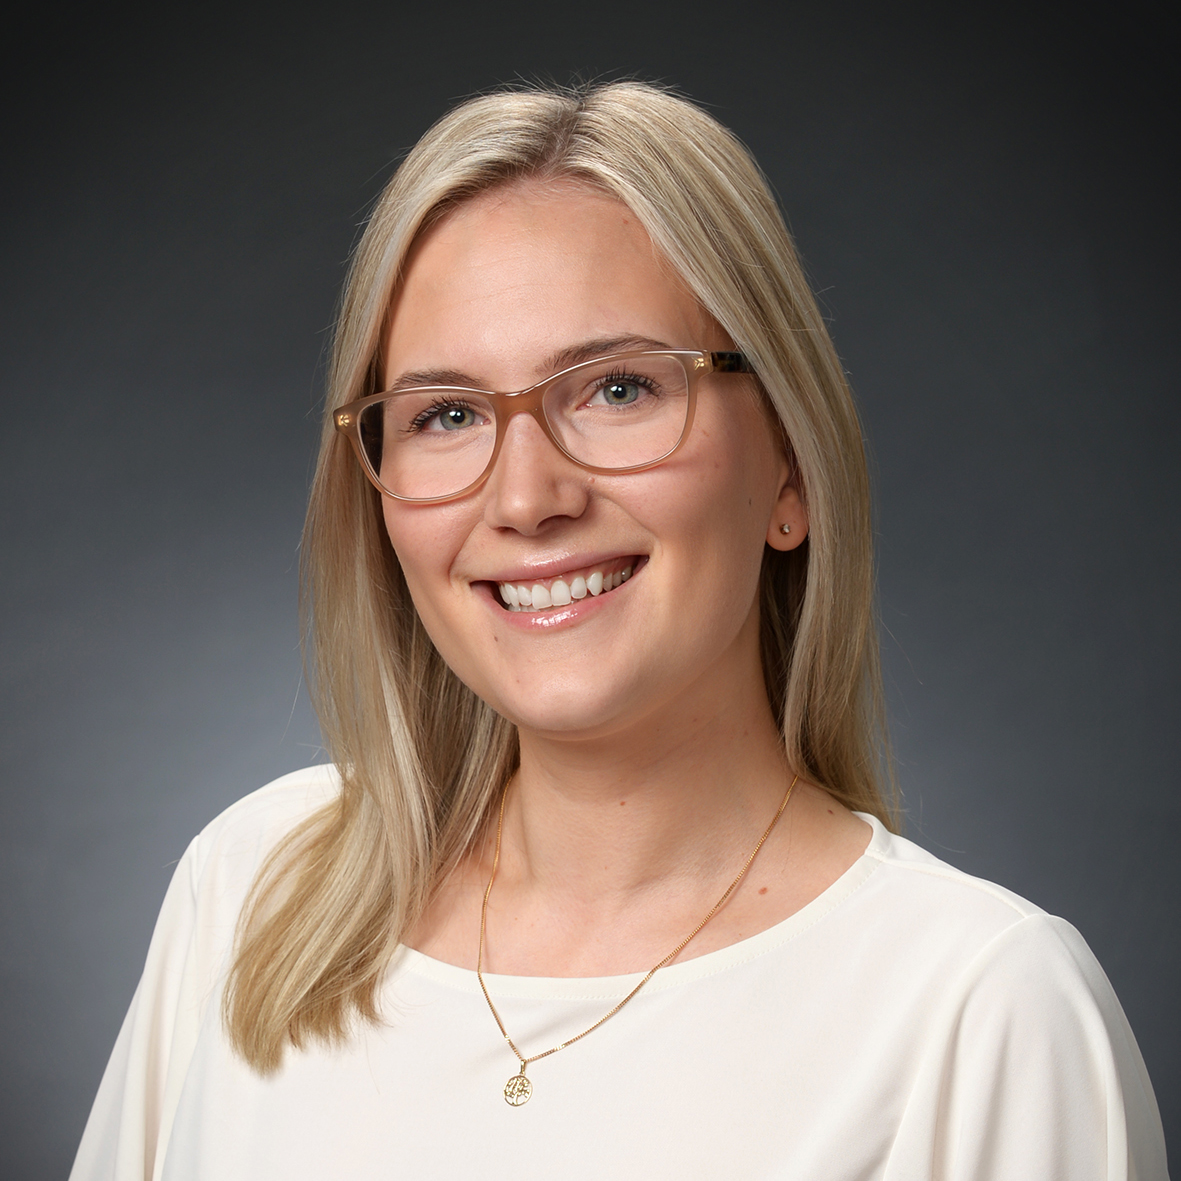 Tiina-Josefina Rantanen